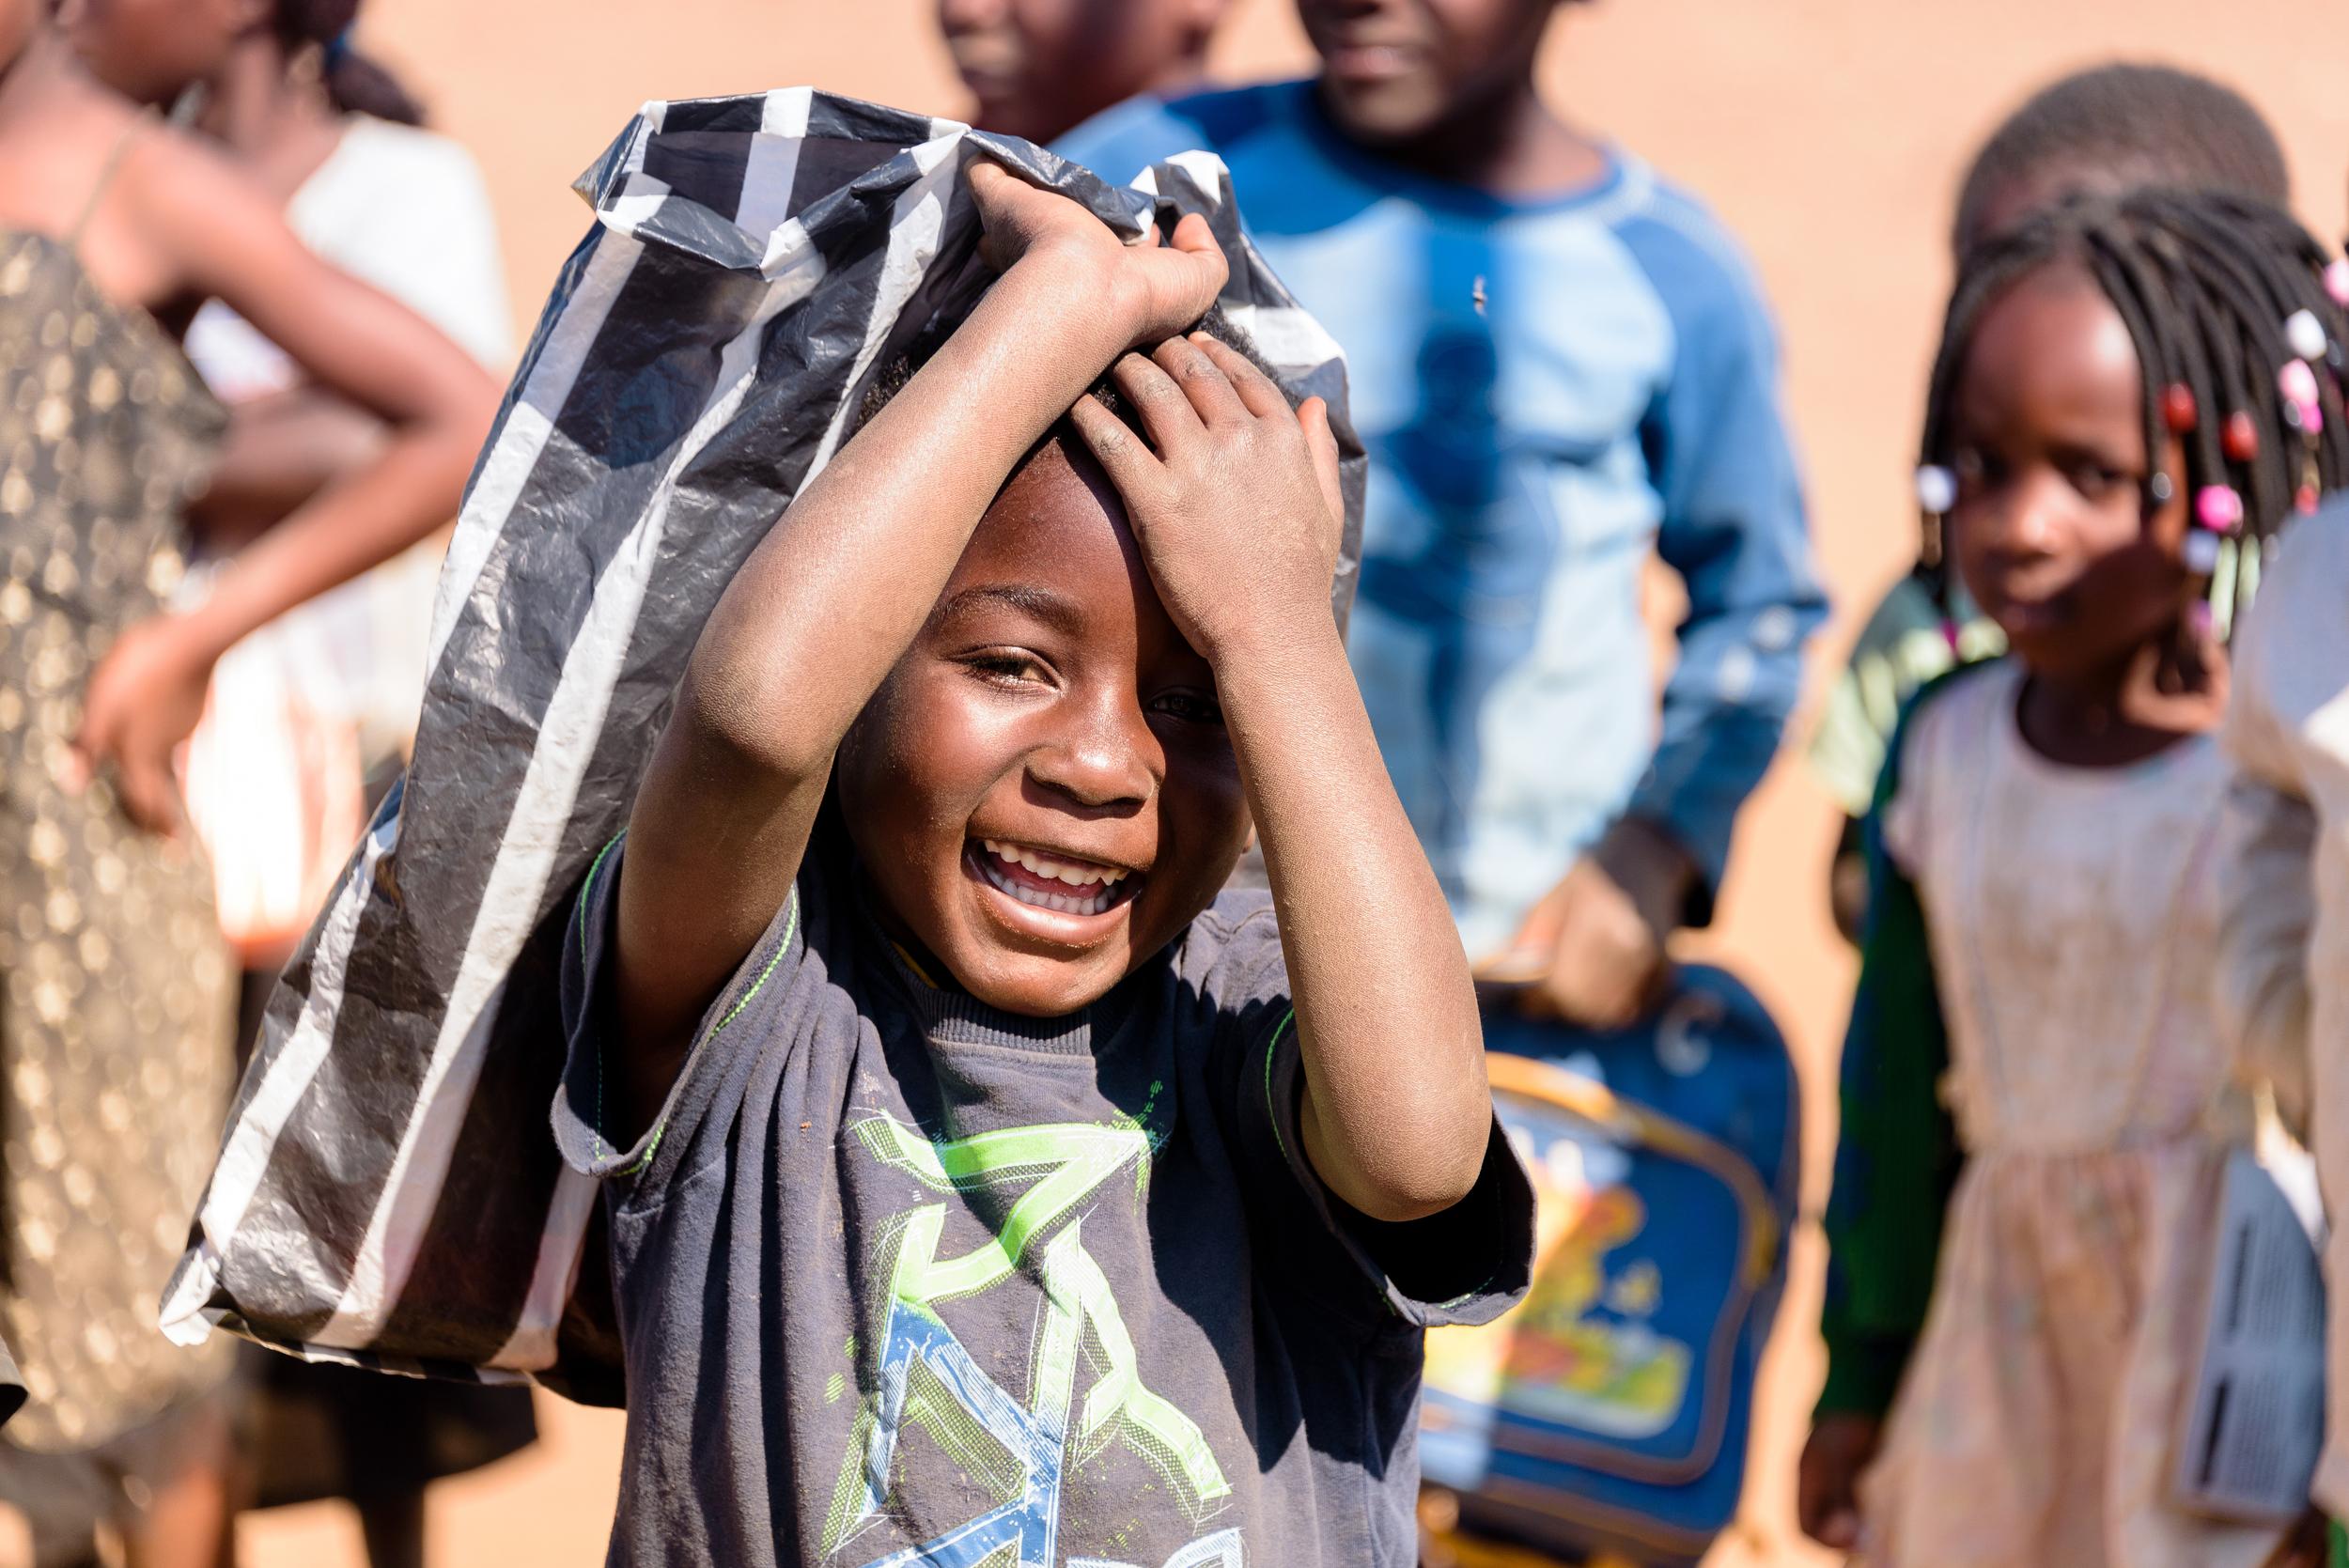 YMI_Zambia_Full-Res-6322 (1).jpg